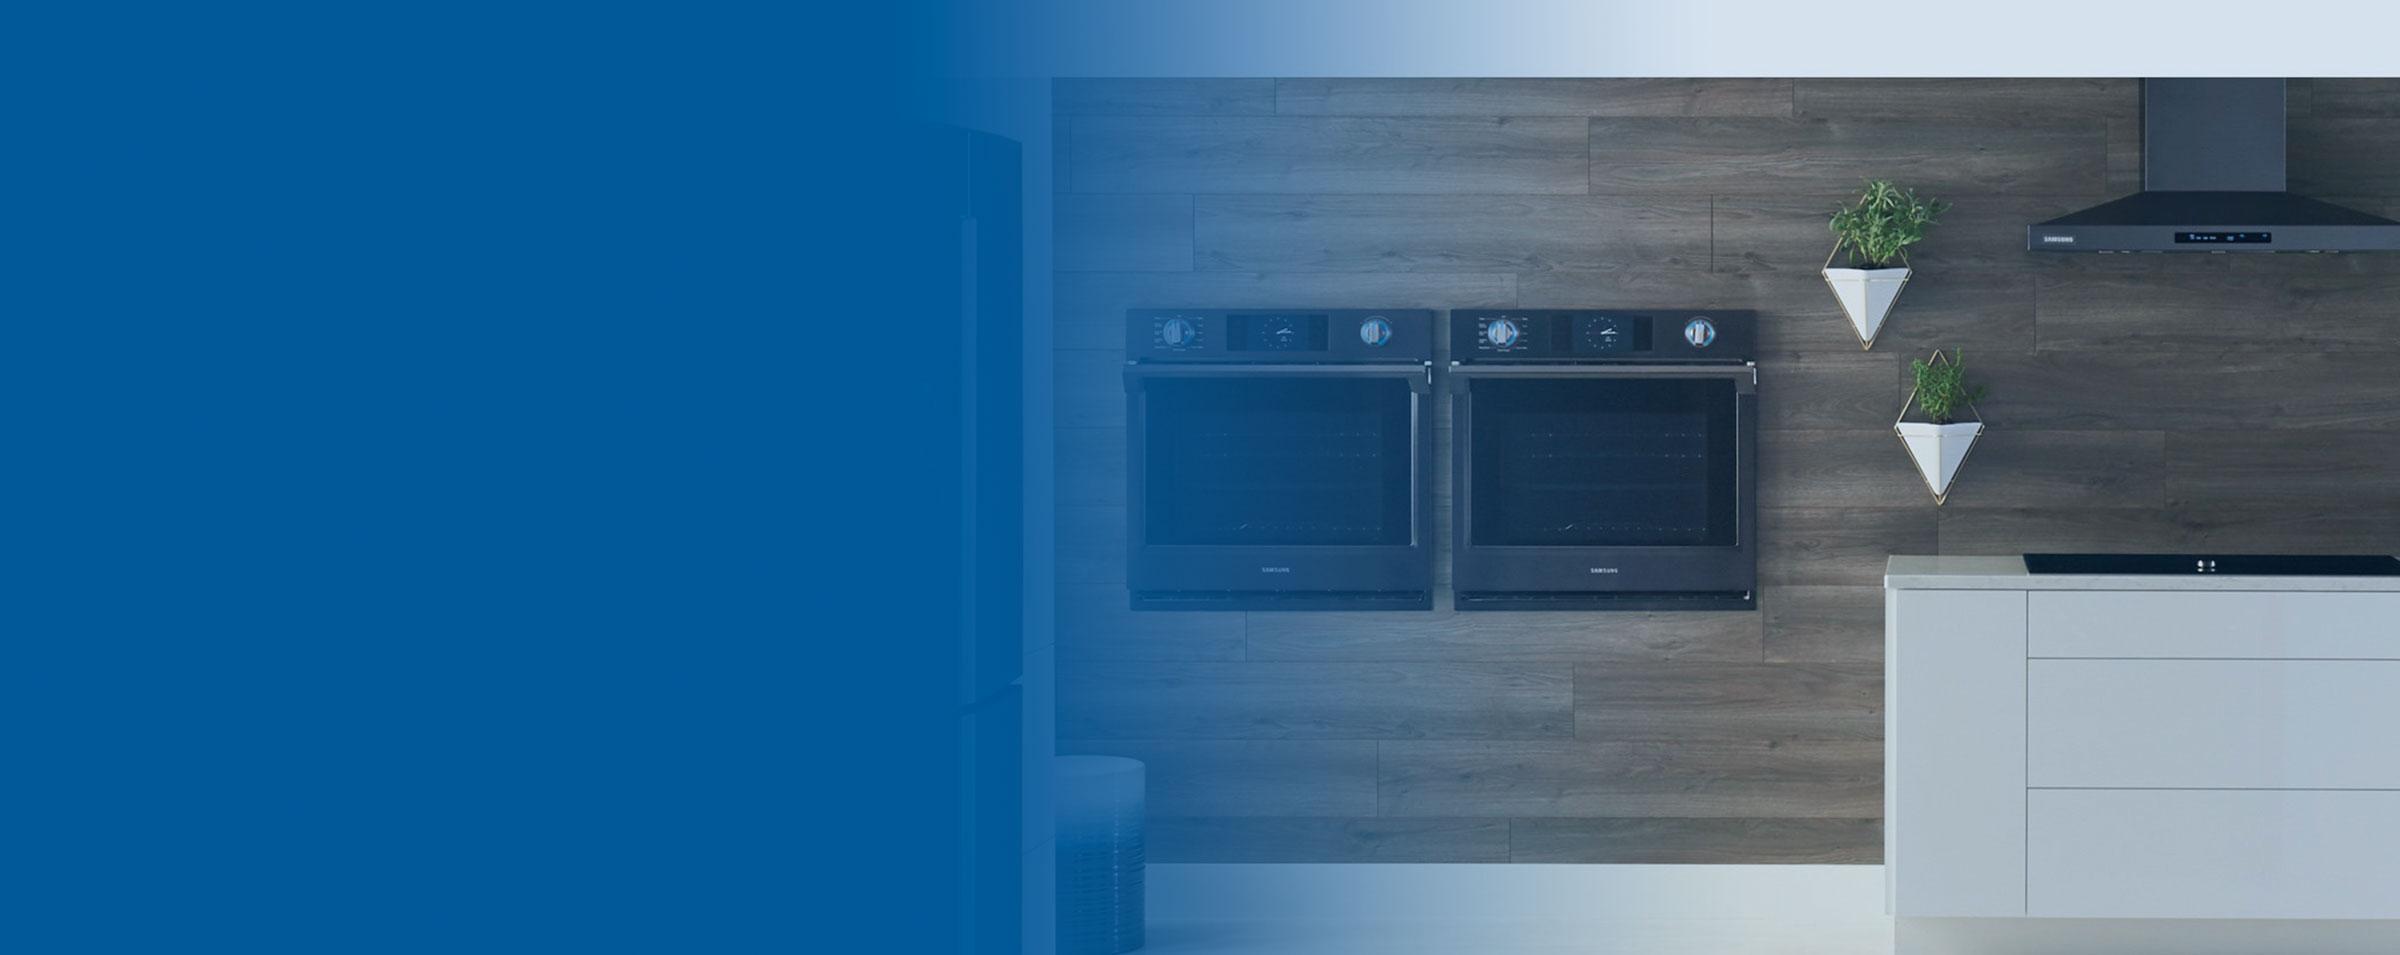 Appliance & Mattress Financing | Maine | Agren